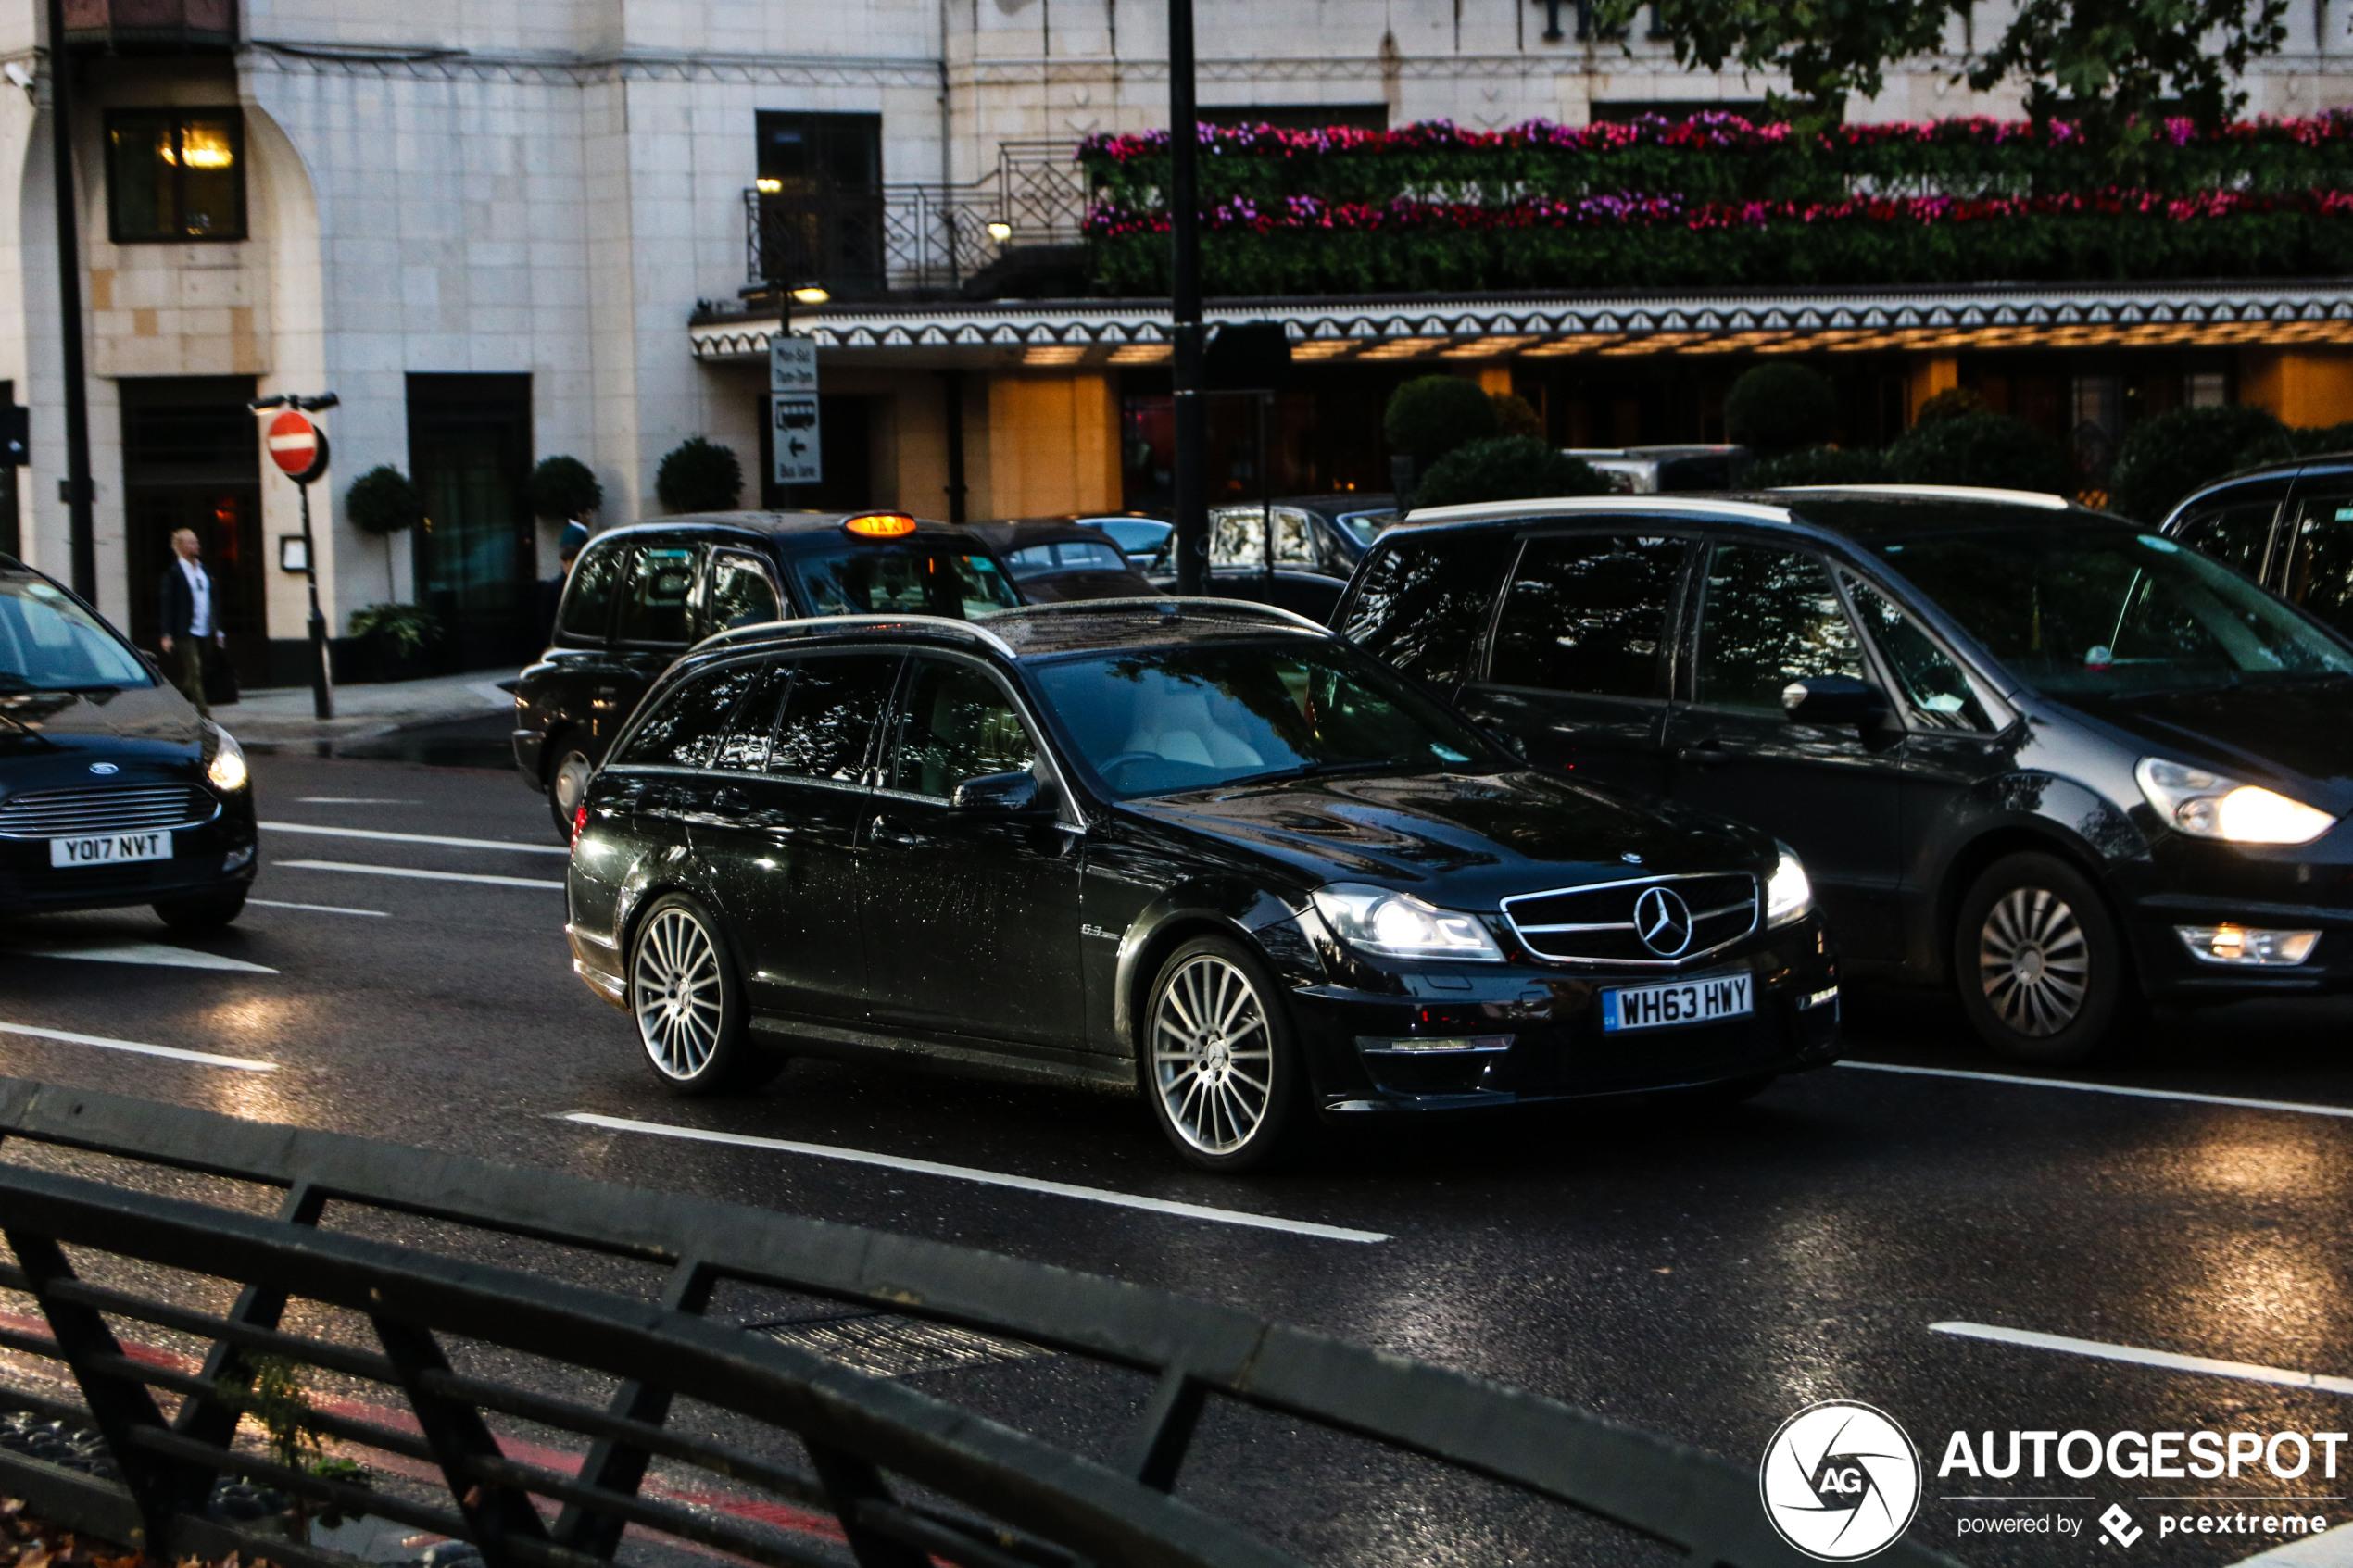 Mercedes Benz C 63 Amg Estate 2012 16 January 2020